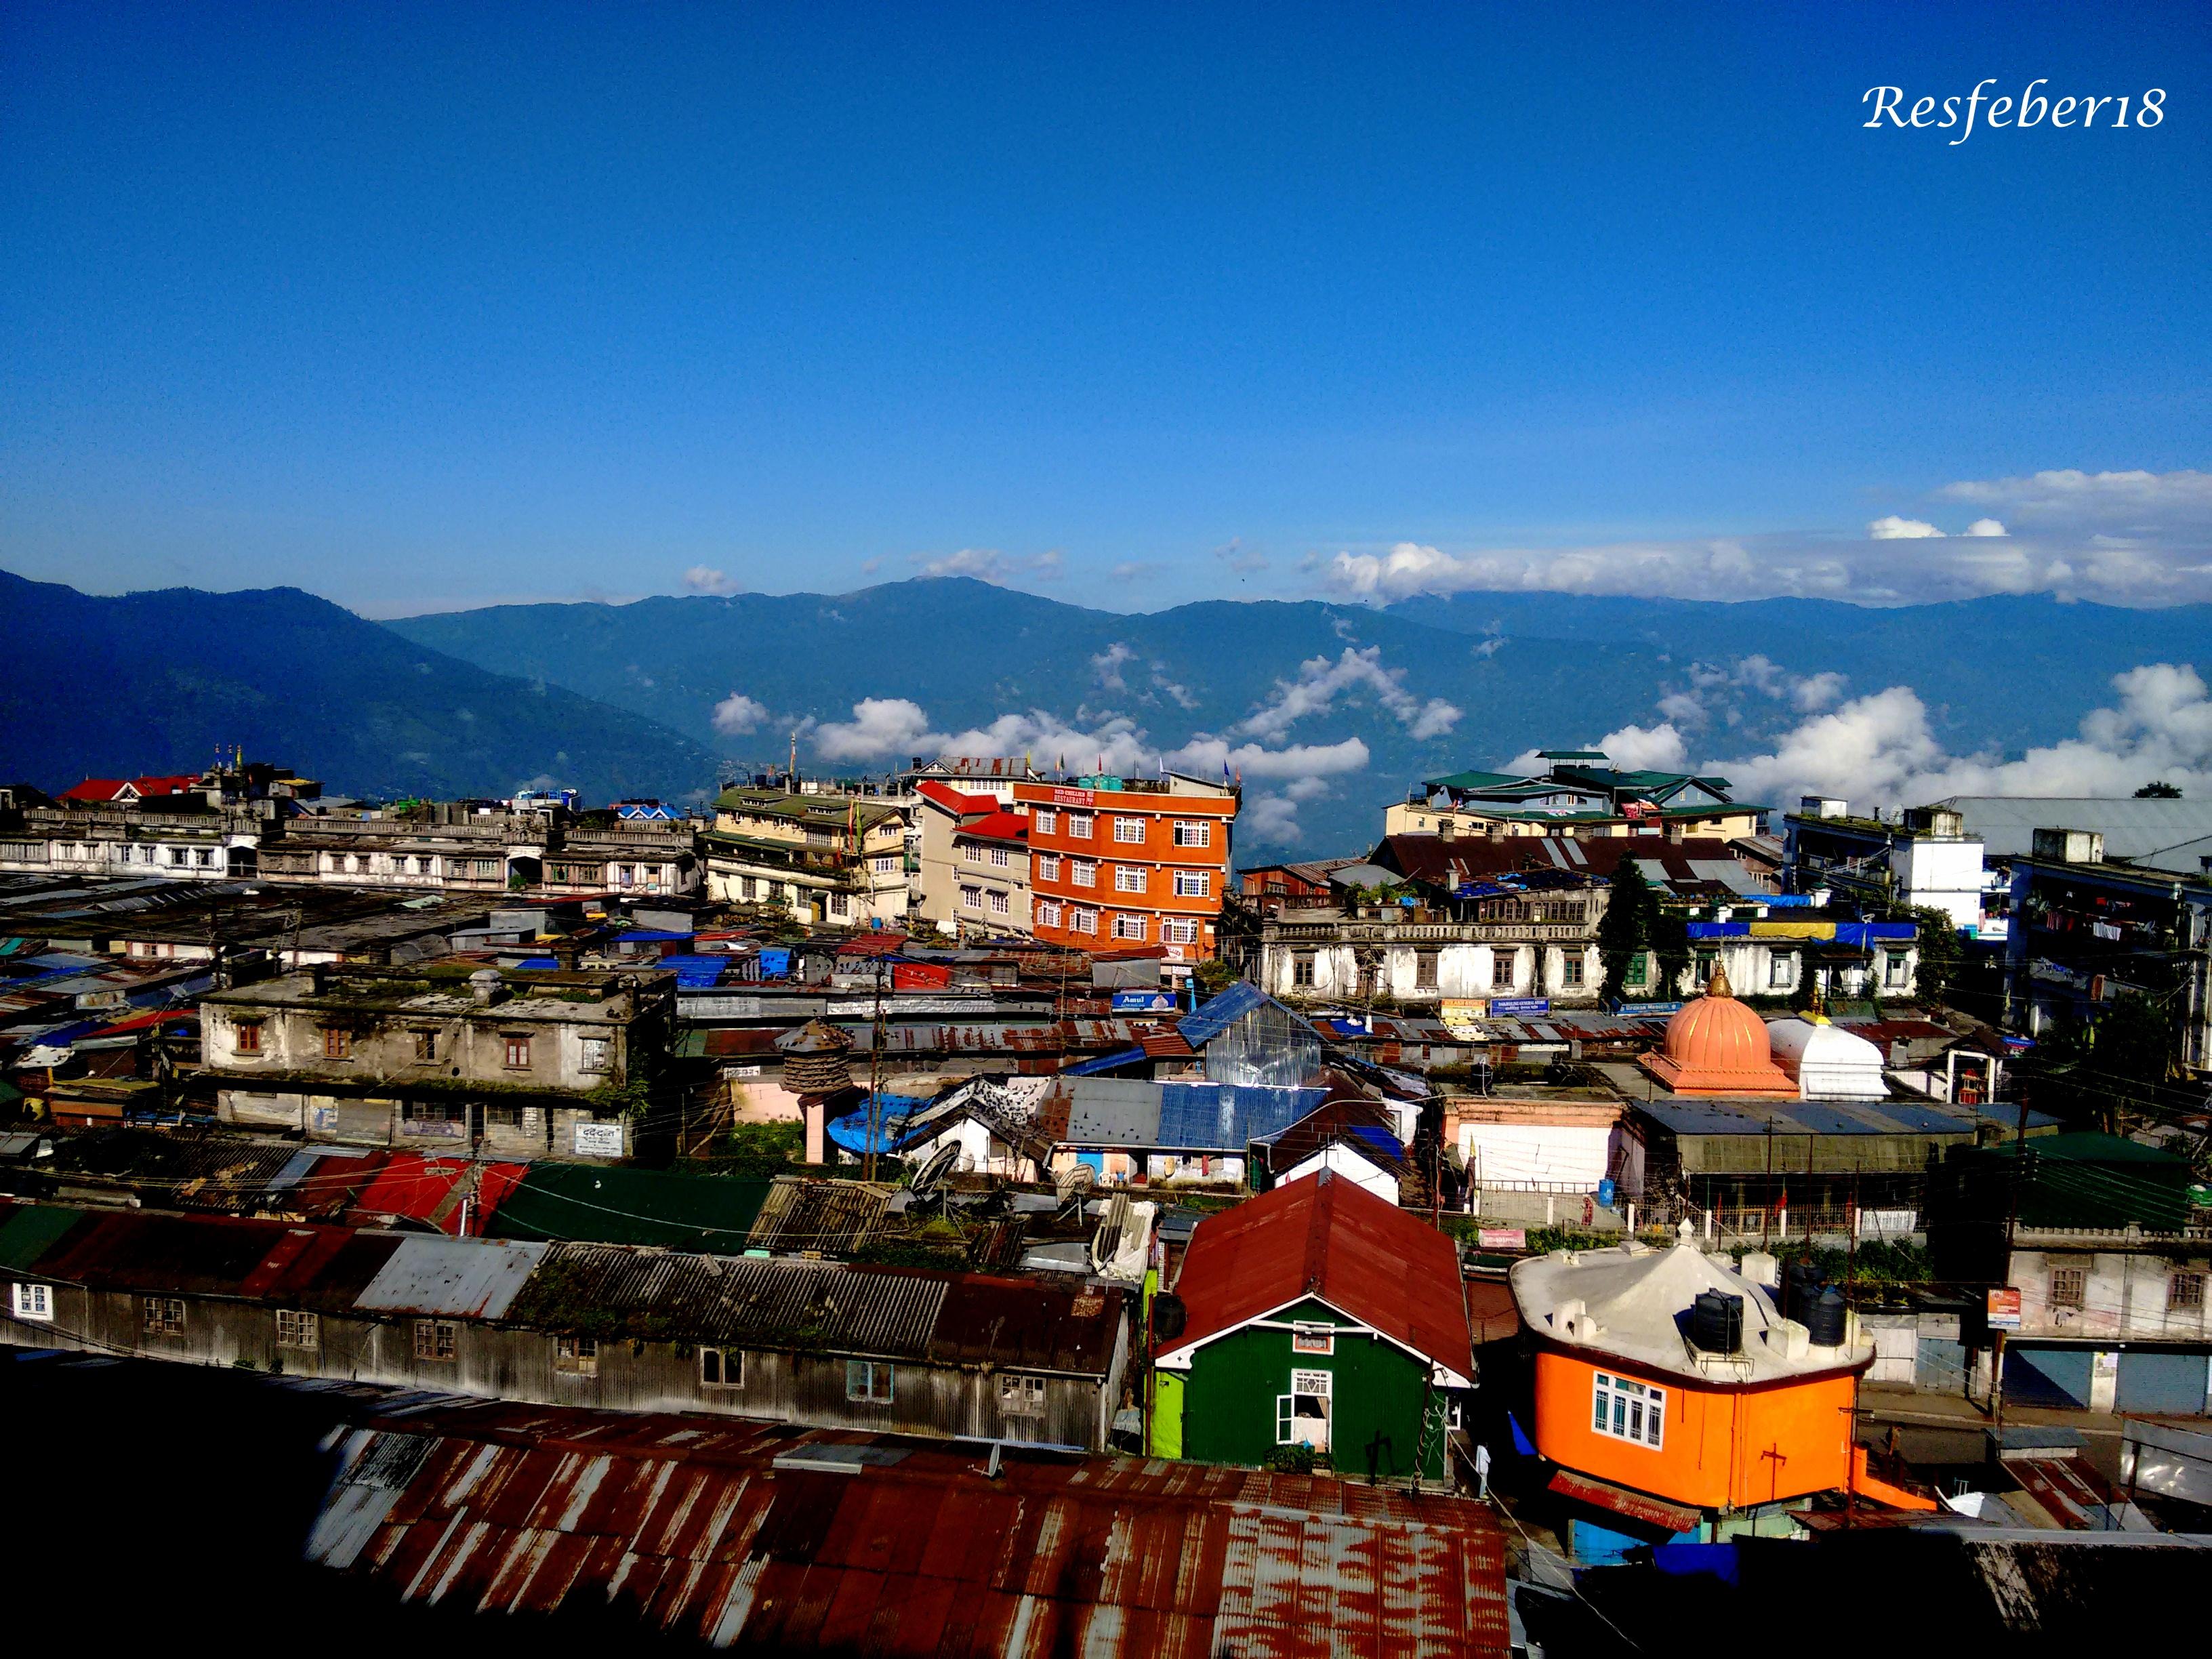 Darjeeling – On a clichéd touristy trail.